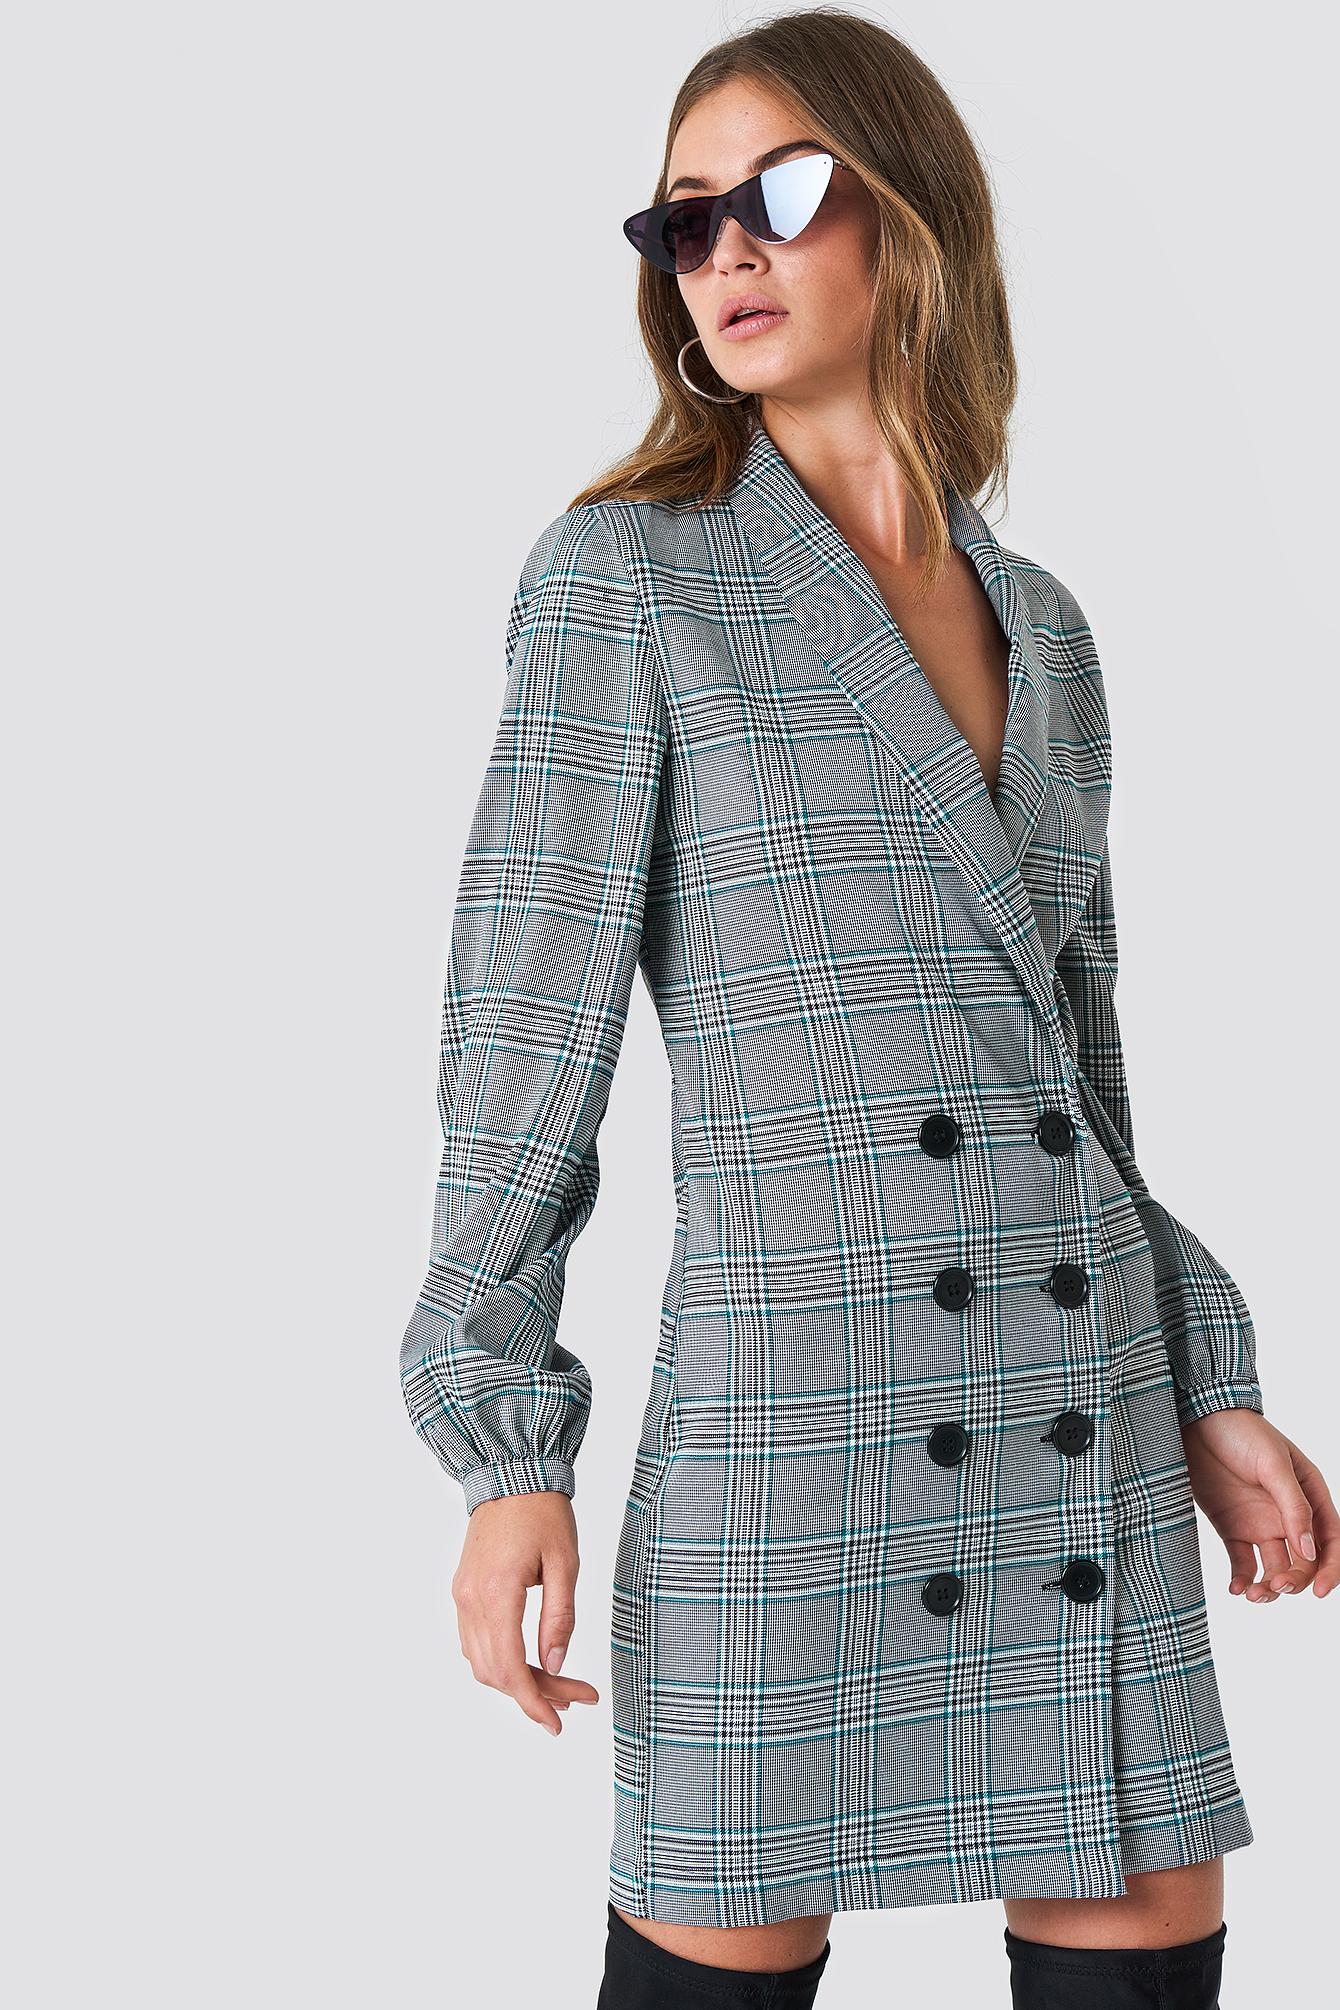 na-kd classic -  Balloon Sleeve Blazer Dress - Grey,Multicolor